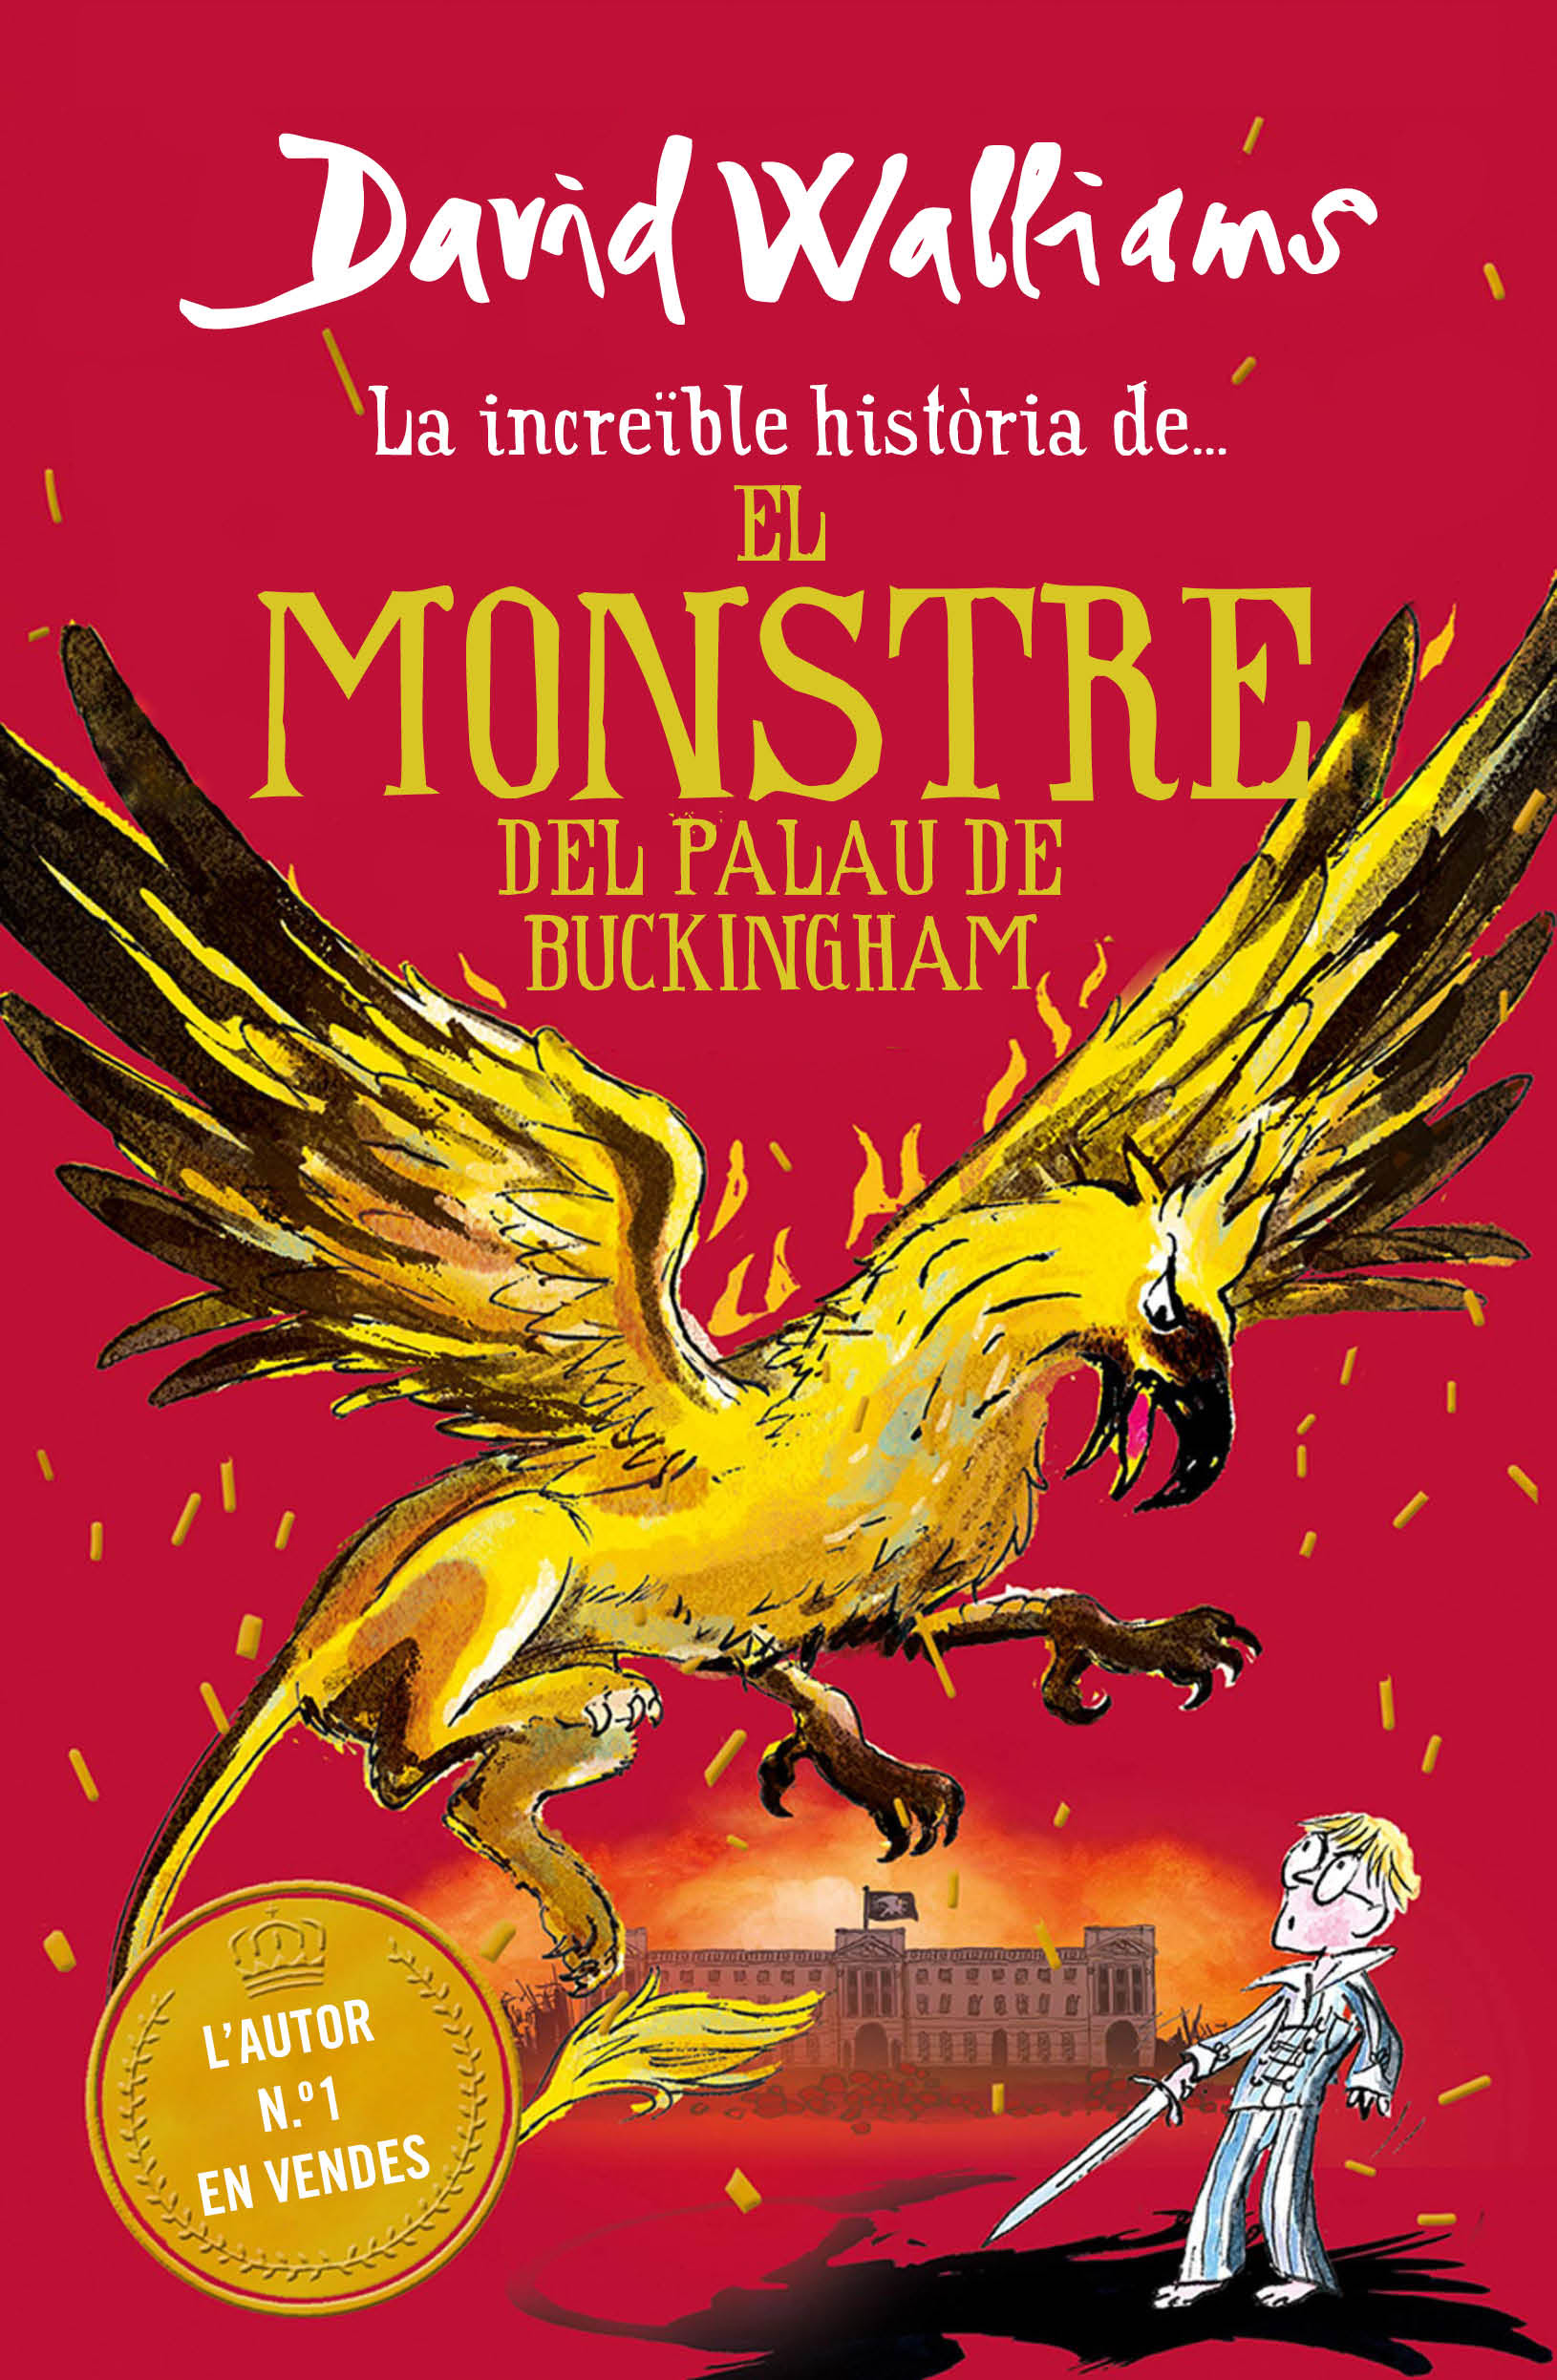 La increible historia de el monstre del palau de buckingham